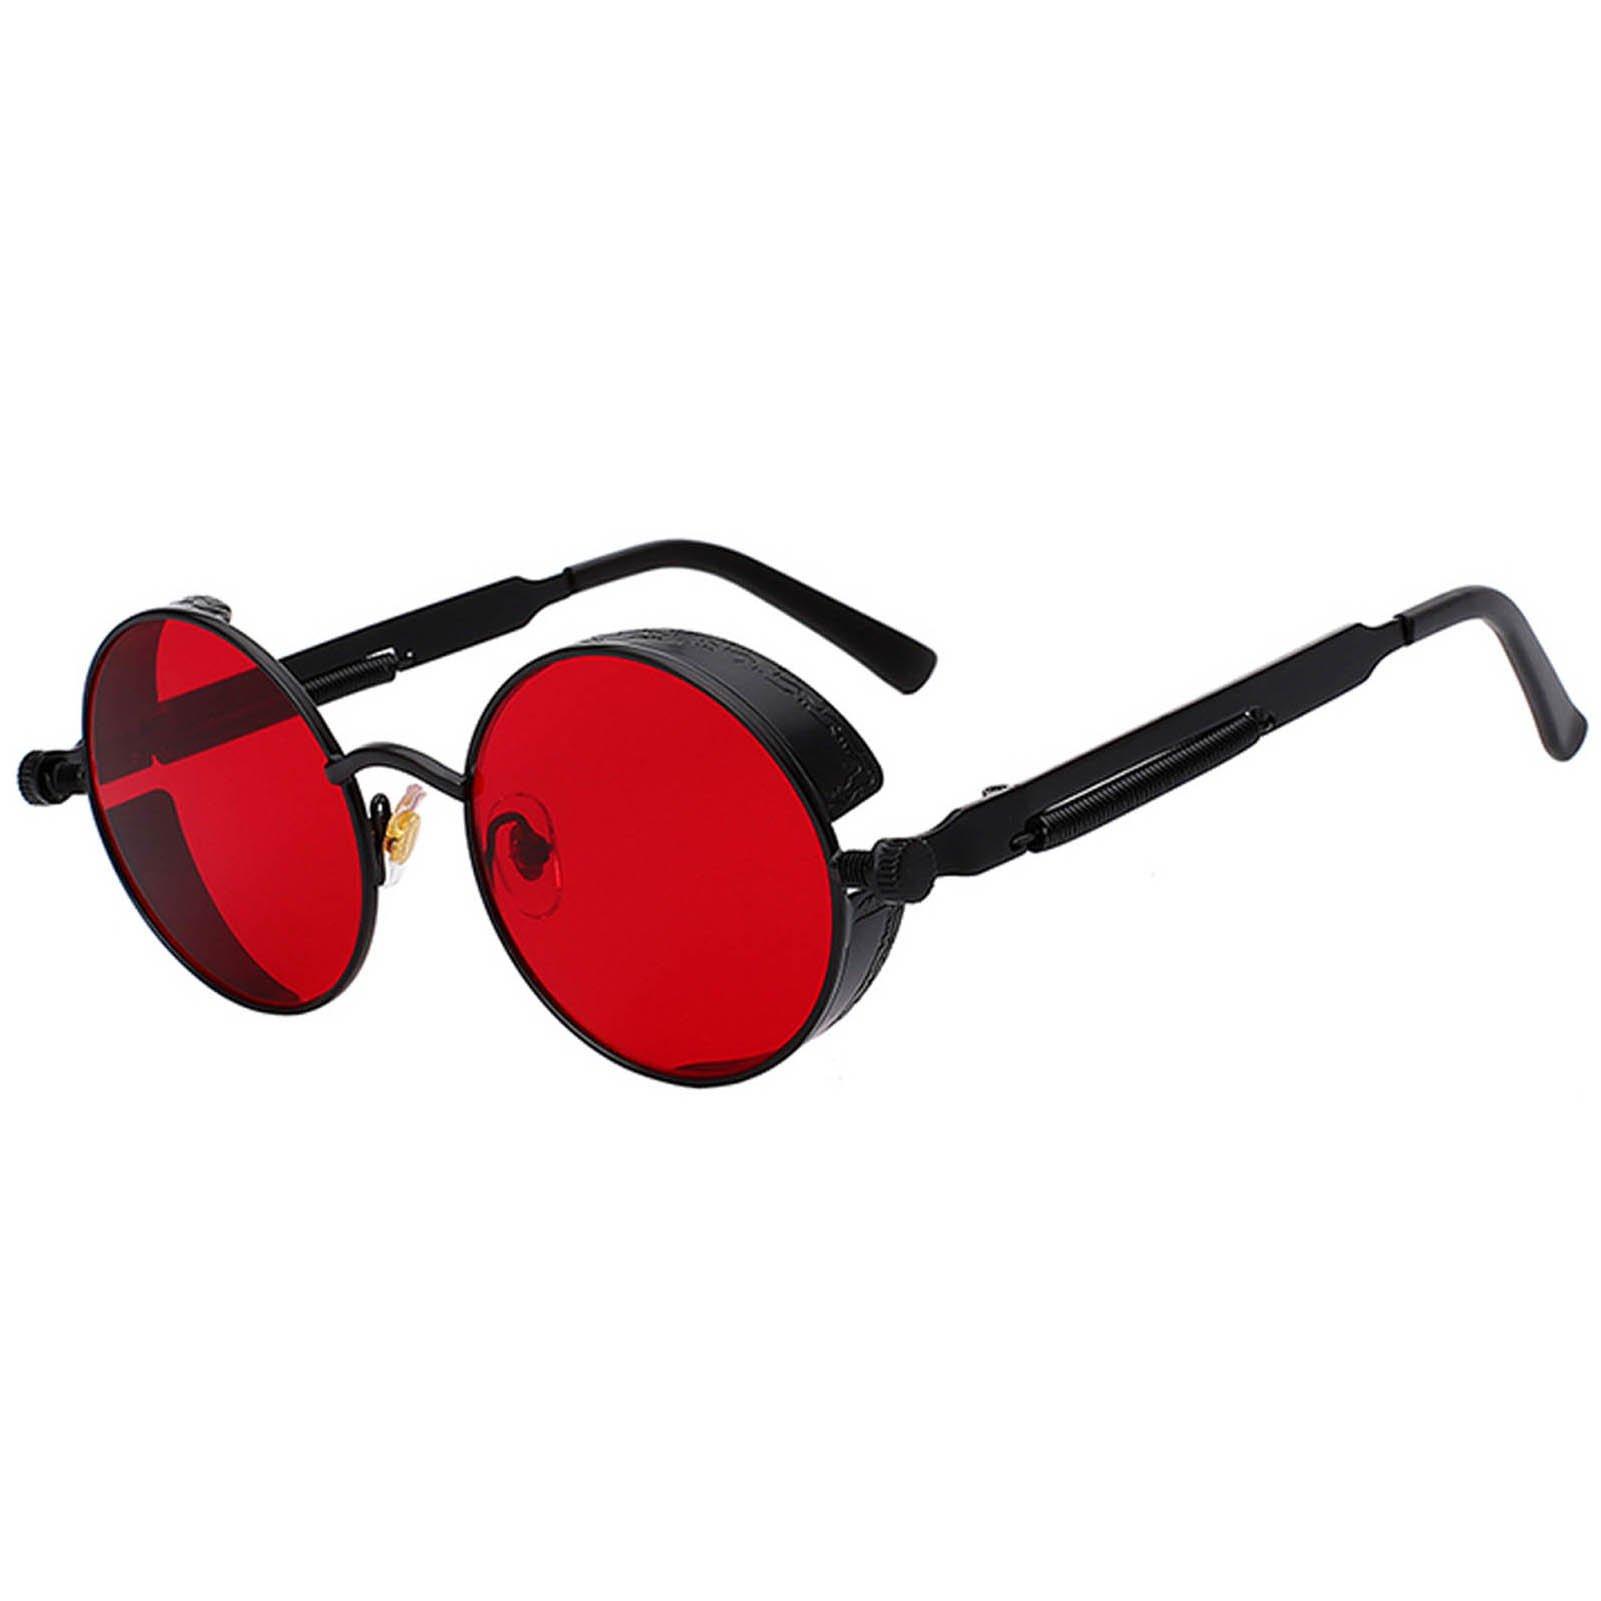 Steampunk Retro Gothic Vintage Hippie Black Metal Round Circle Frame Sunglasses Sea Red Lens OWL